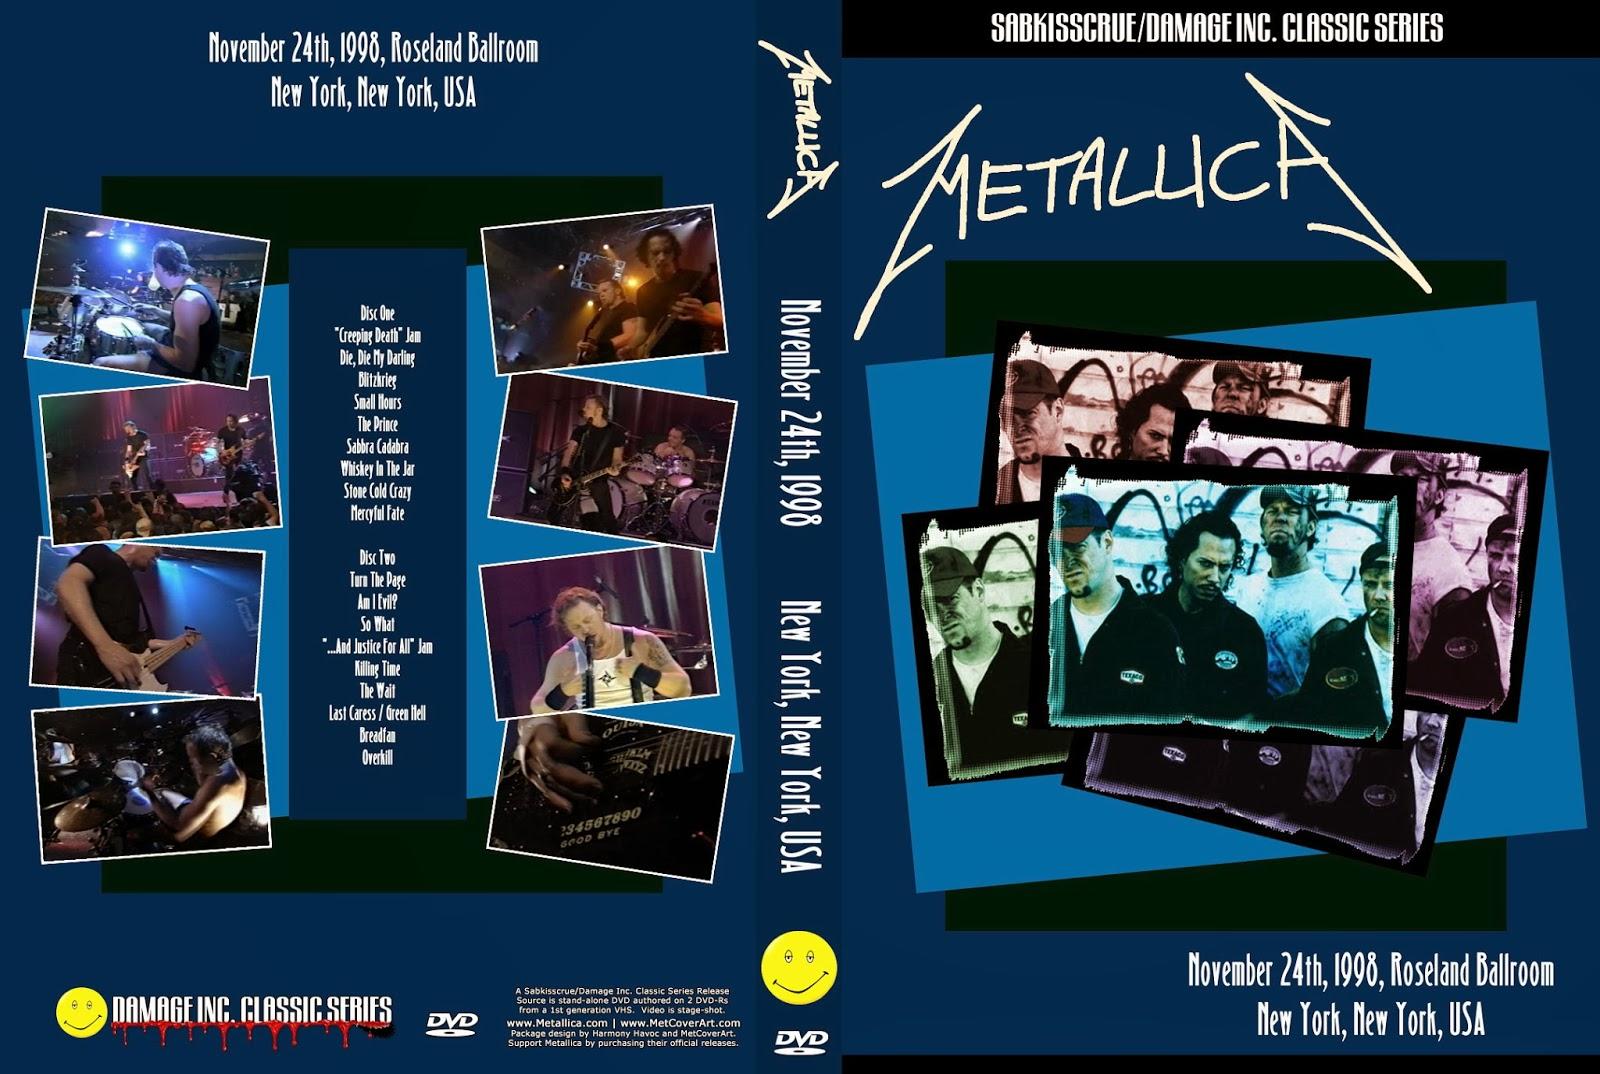 T.U.B.E.: Metallica - 1998-11-24 - New York, NY (2xDVDfull ...